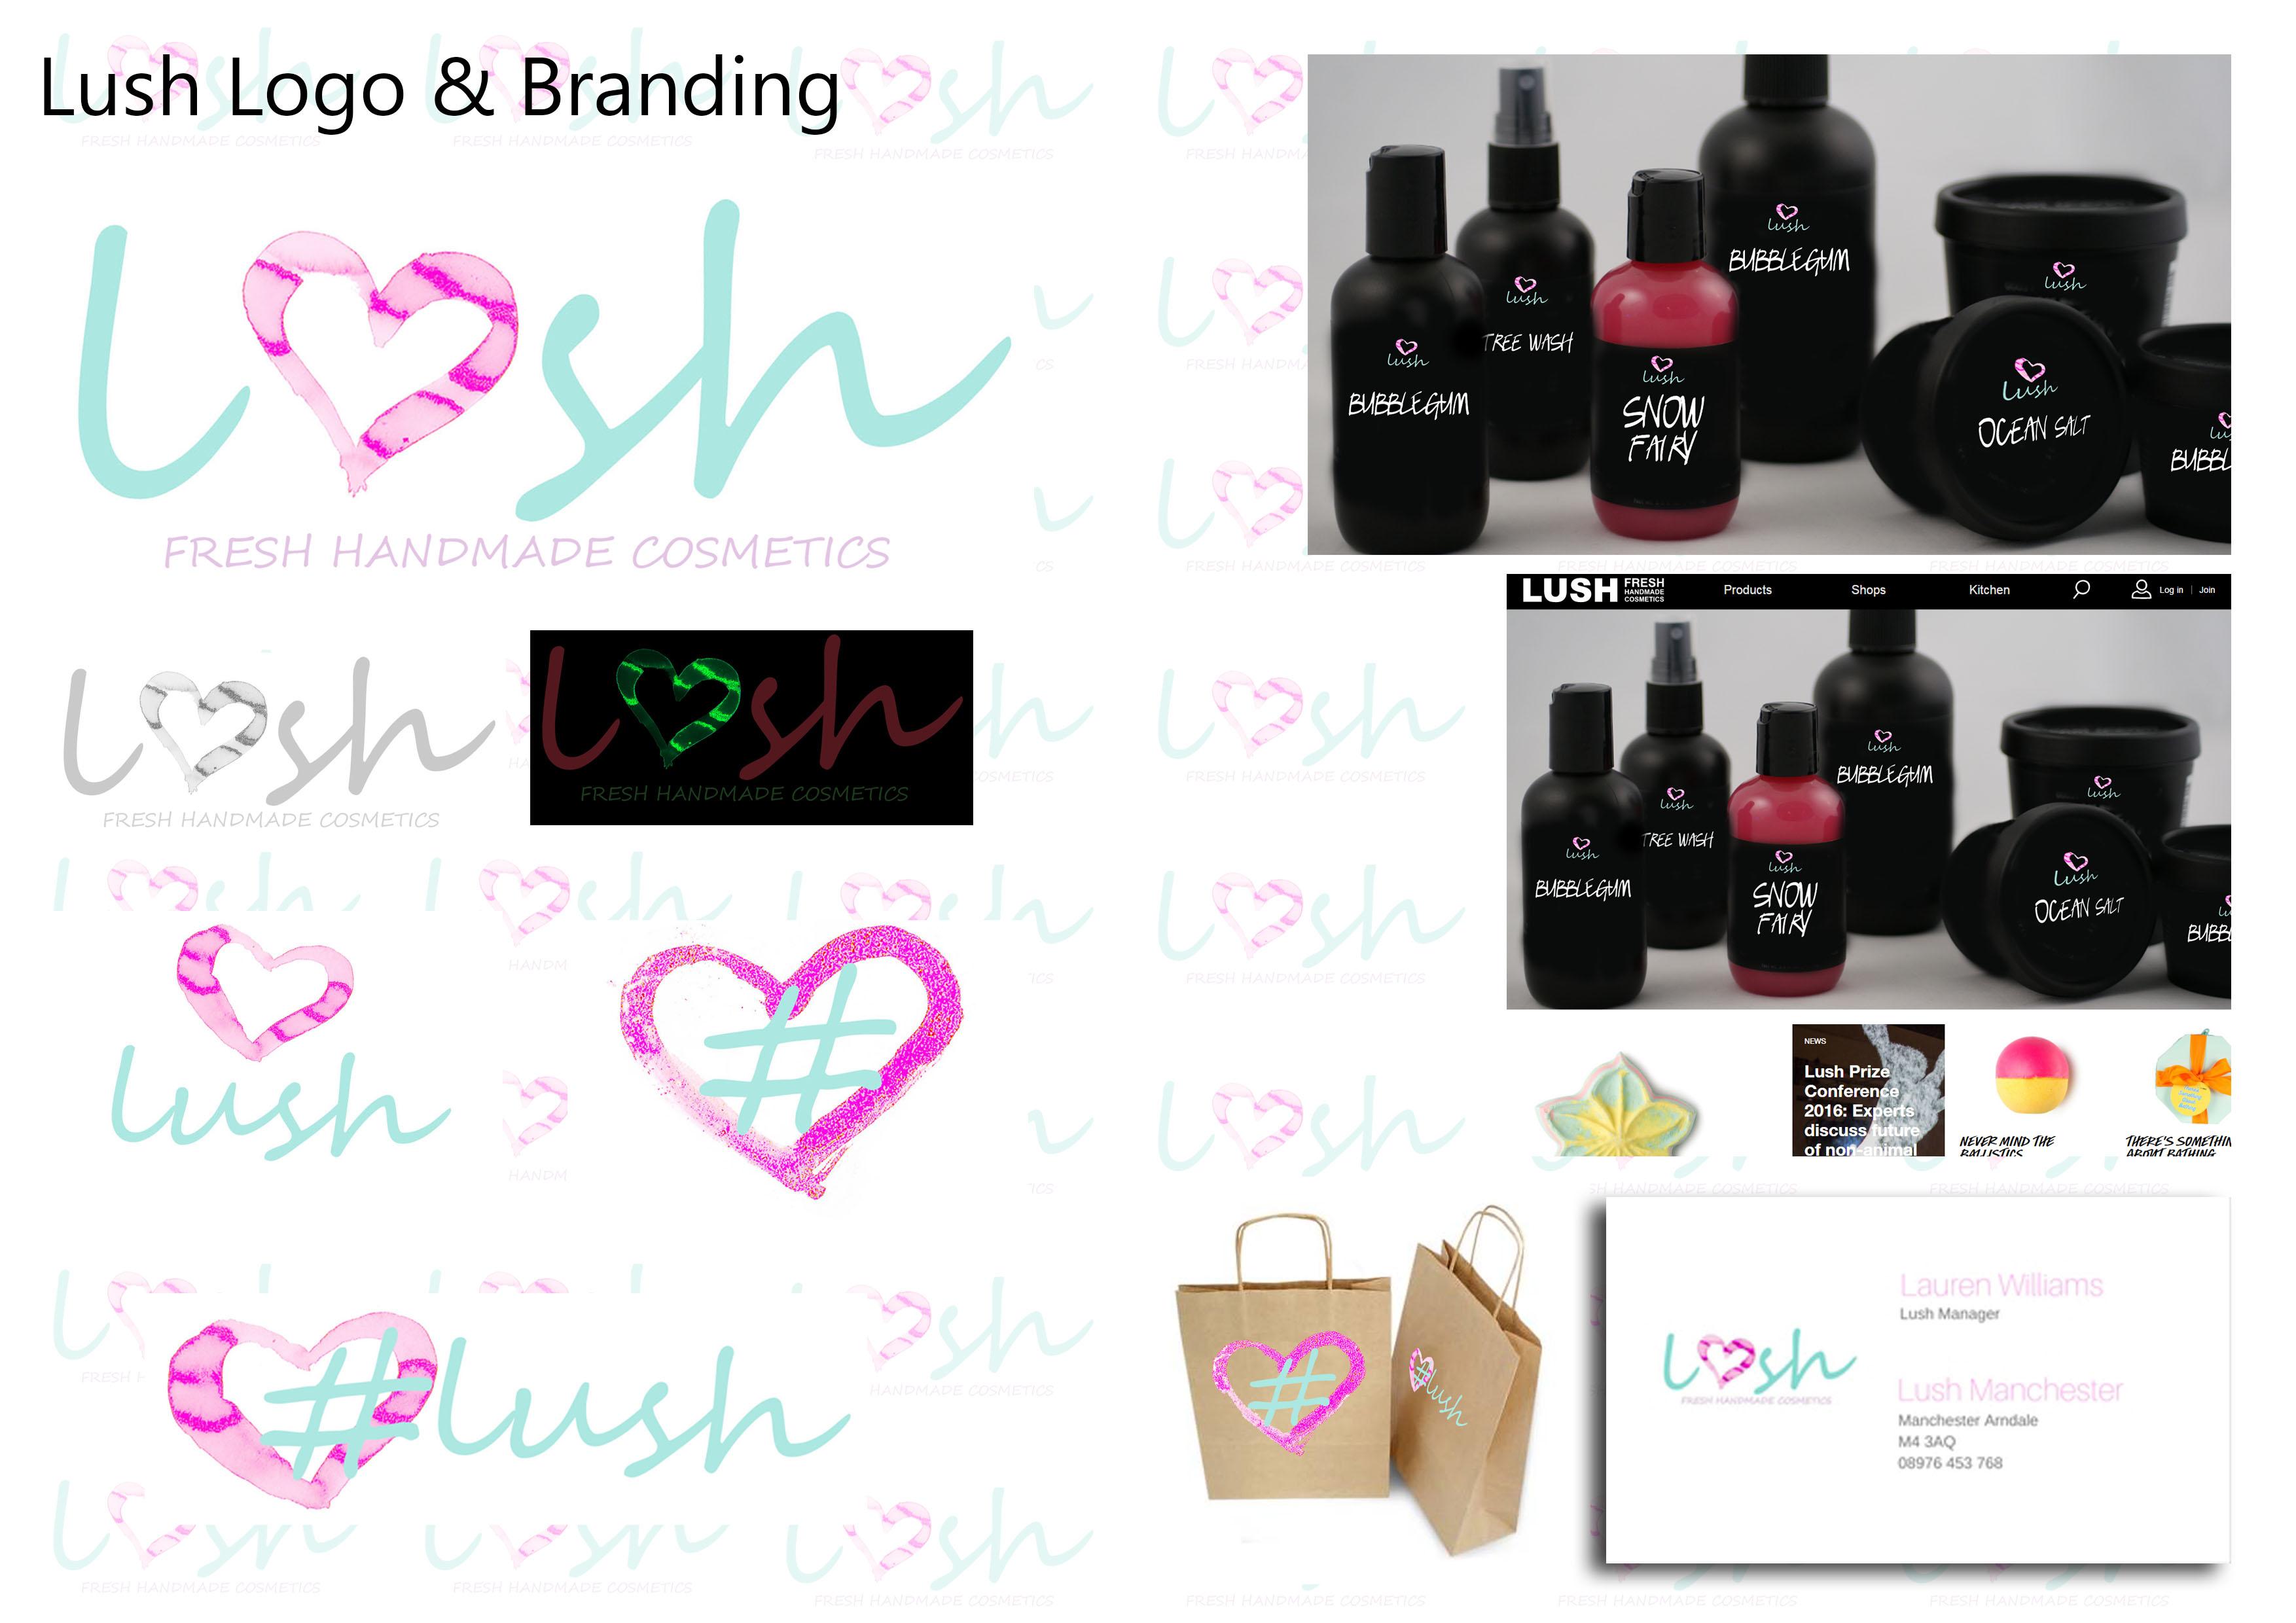 Lush Logo Rebrand Concept